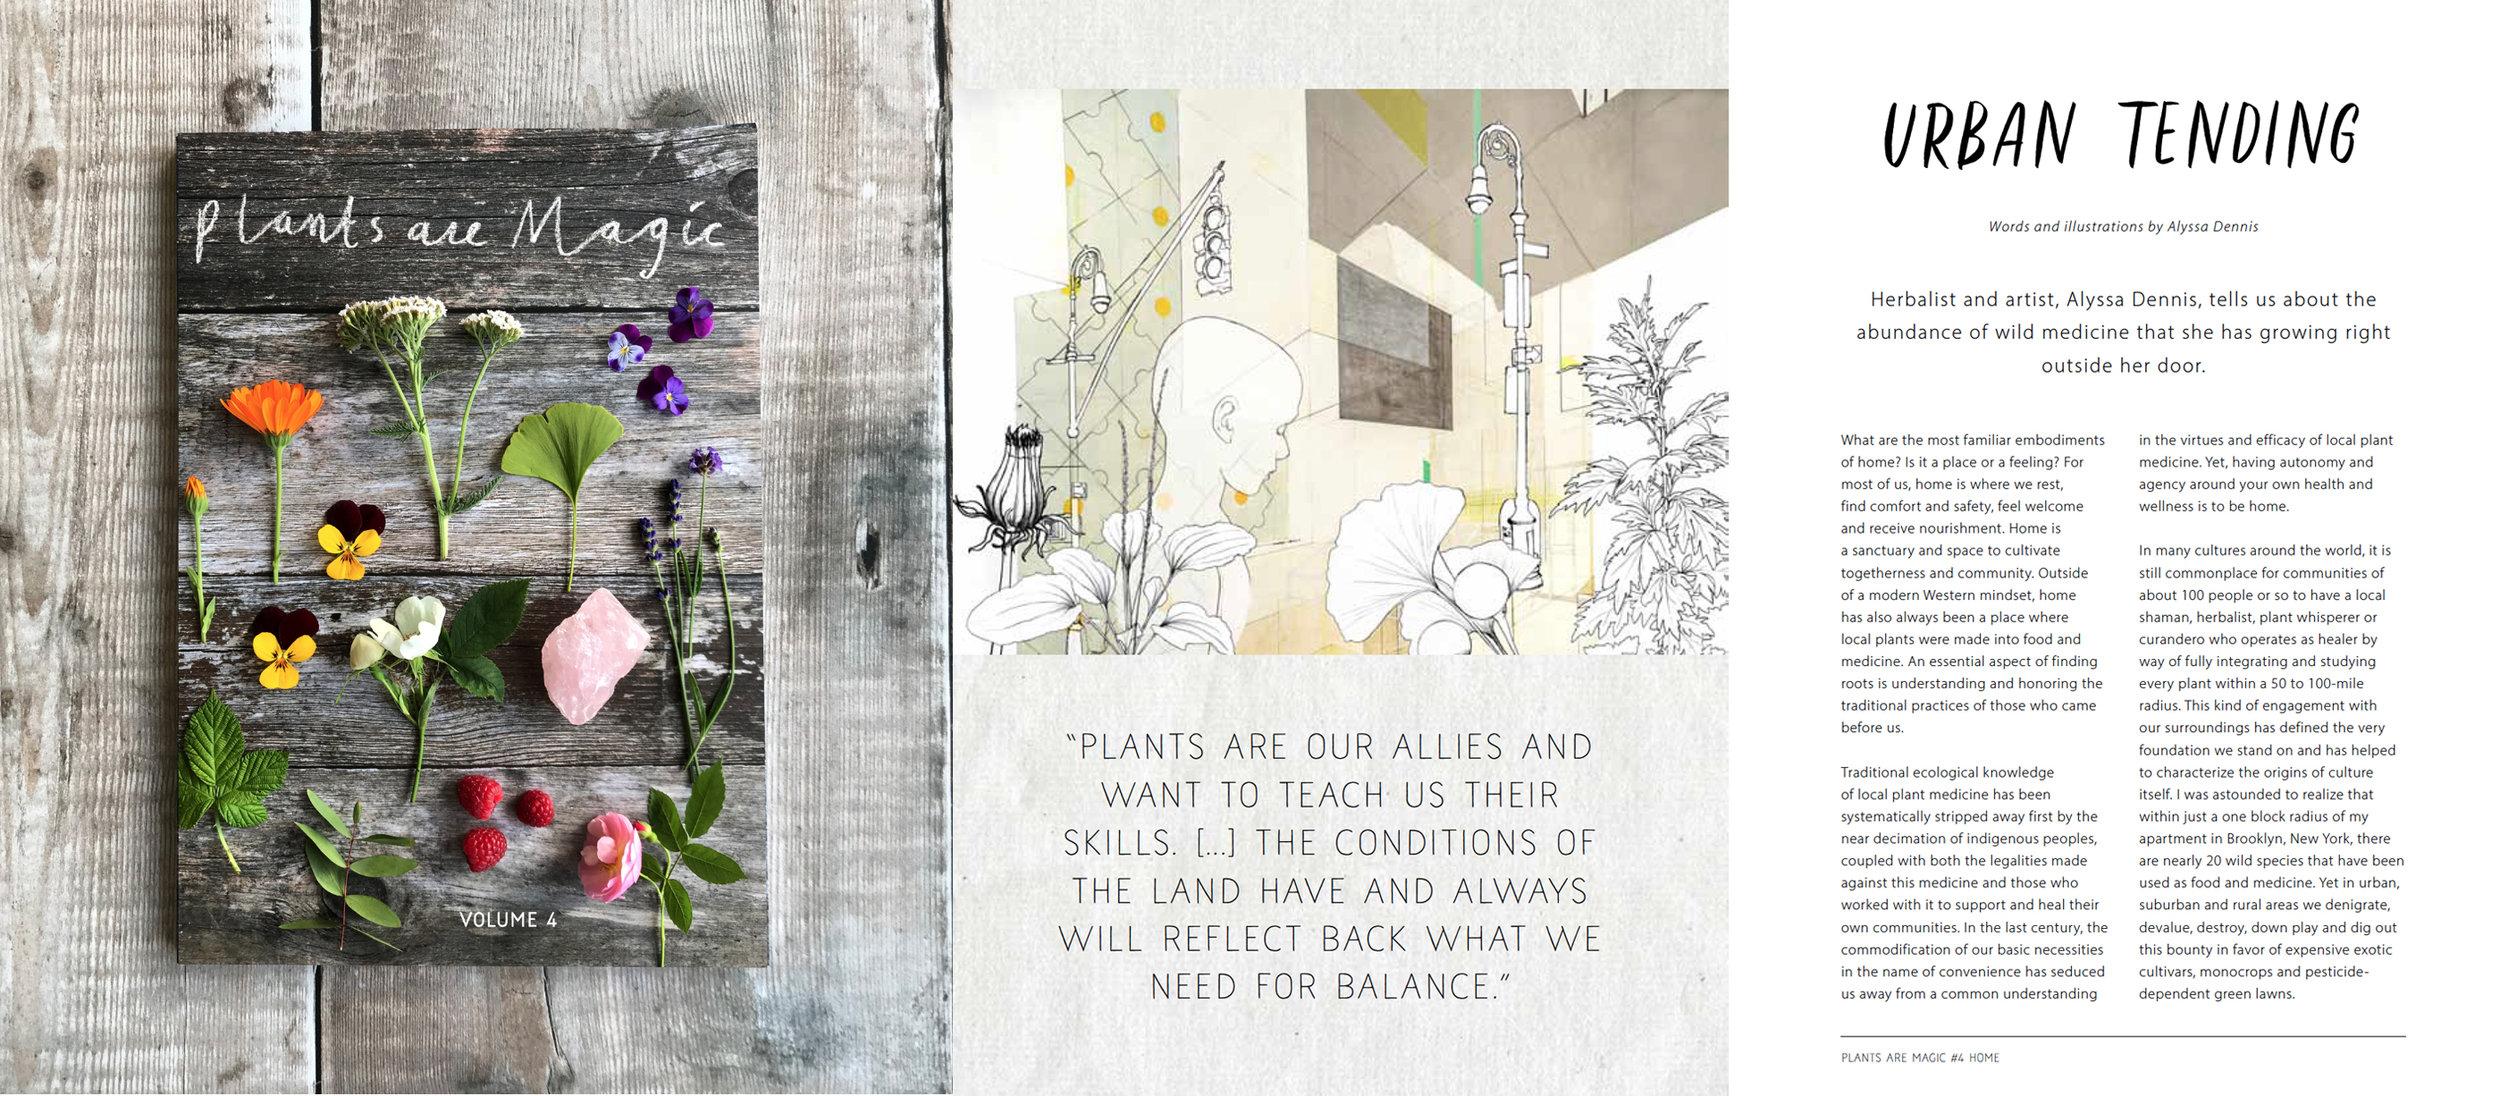 PlantsAreMagic-UrbanTending.jpeg